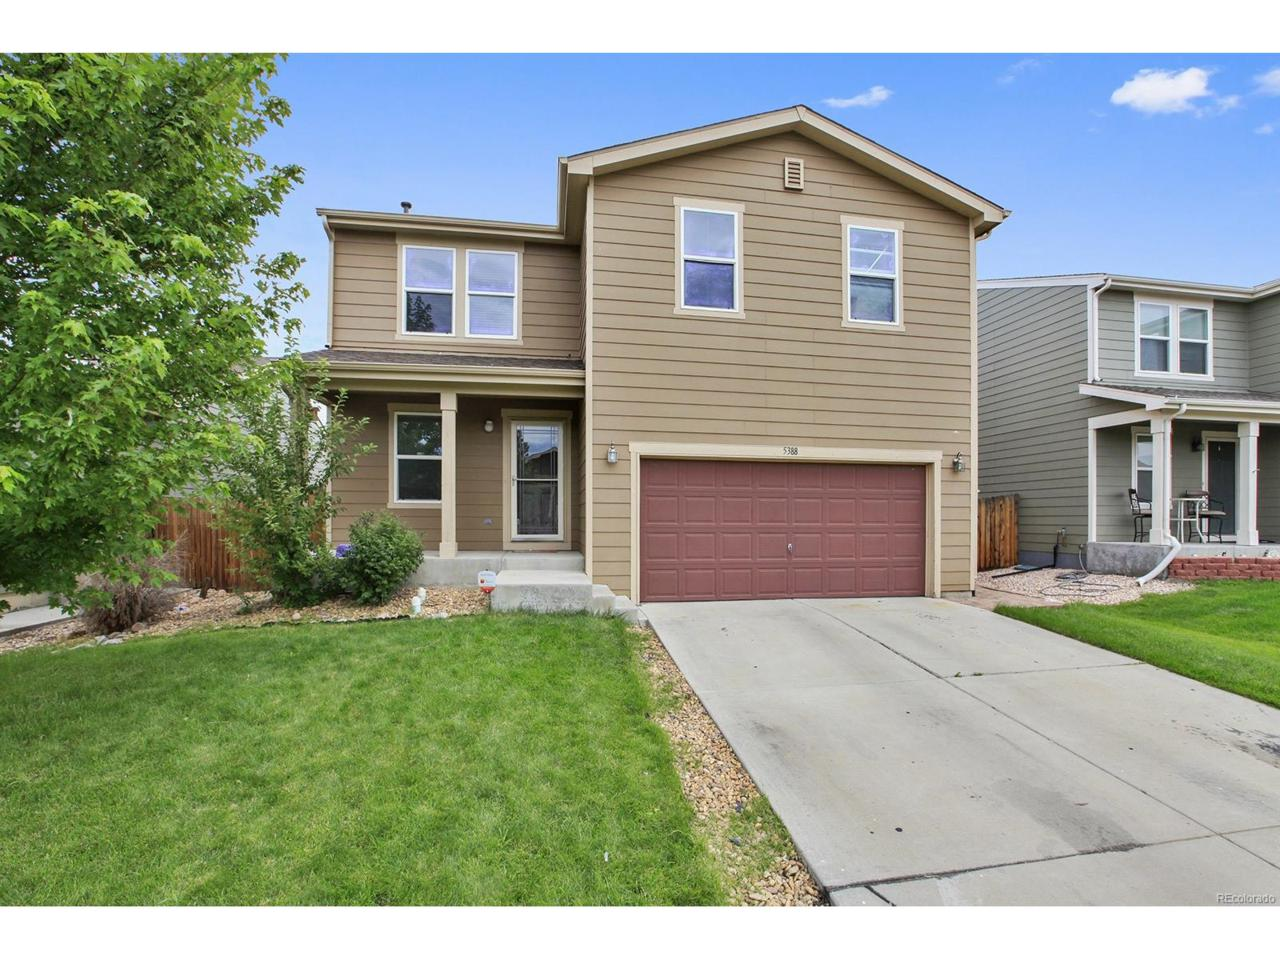 5388 Laredo Court, Denver, CO 80239 (MLS #7995149) :: 8z Real Estate